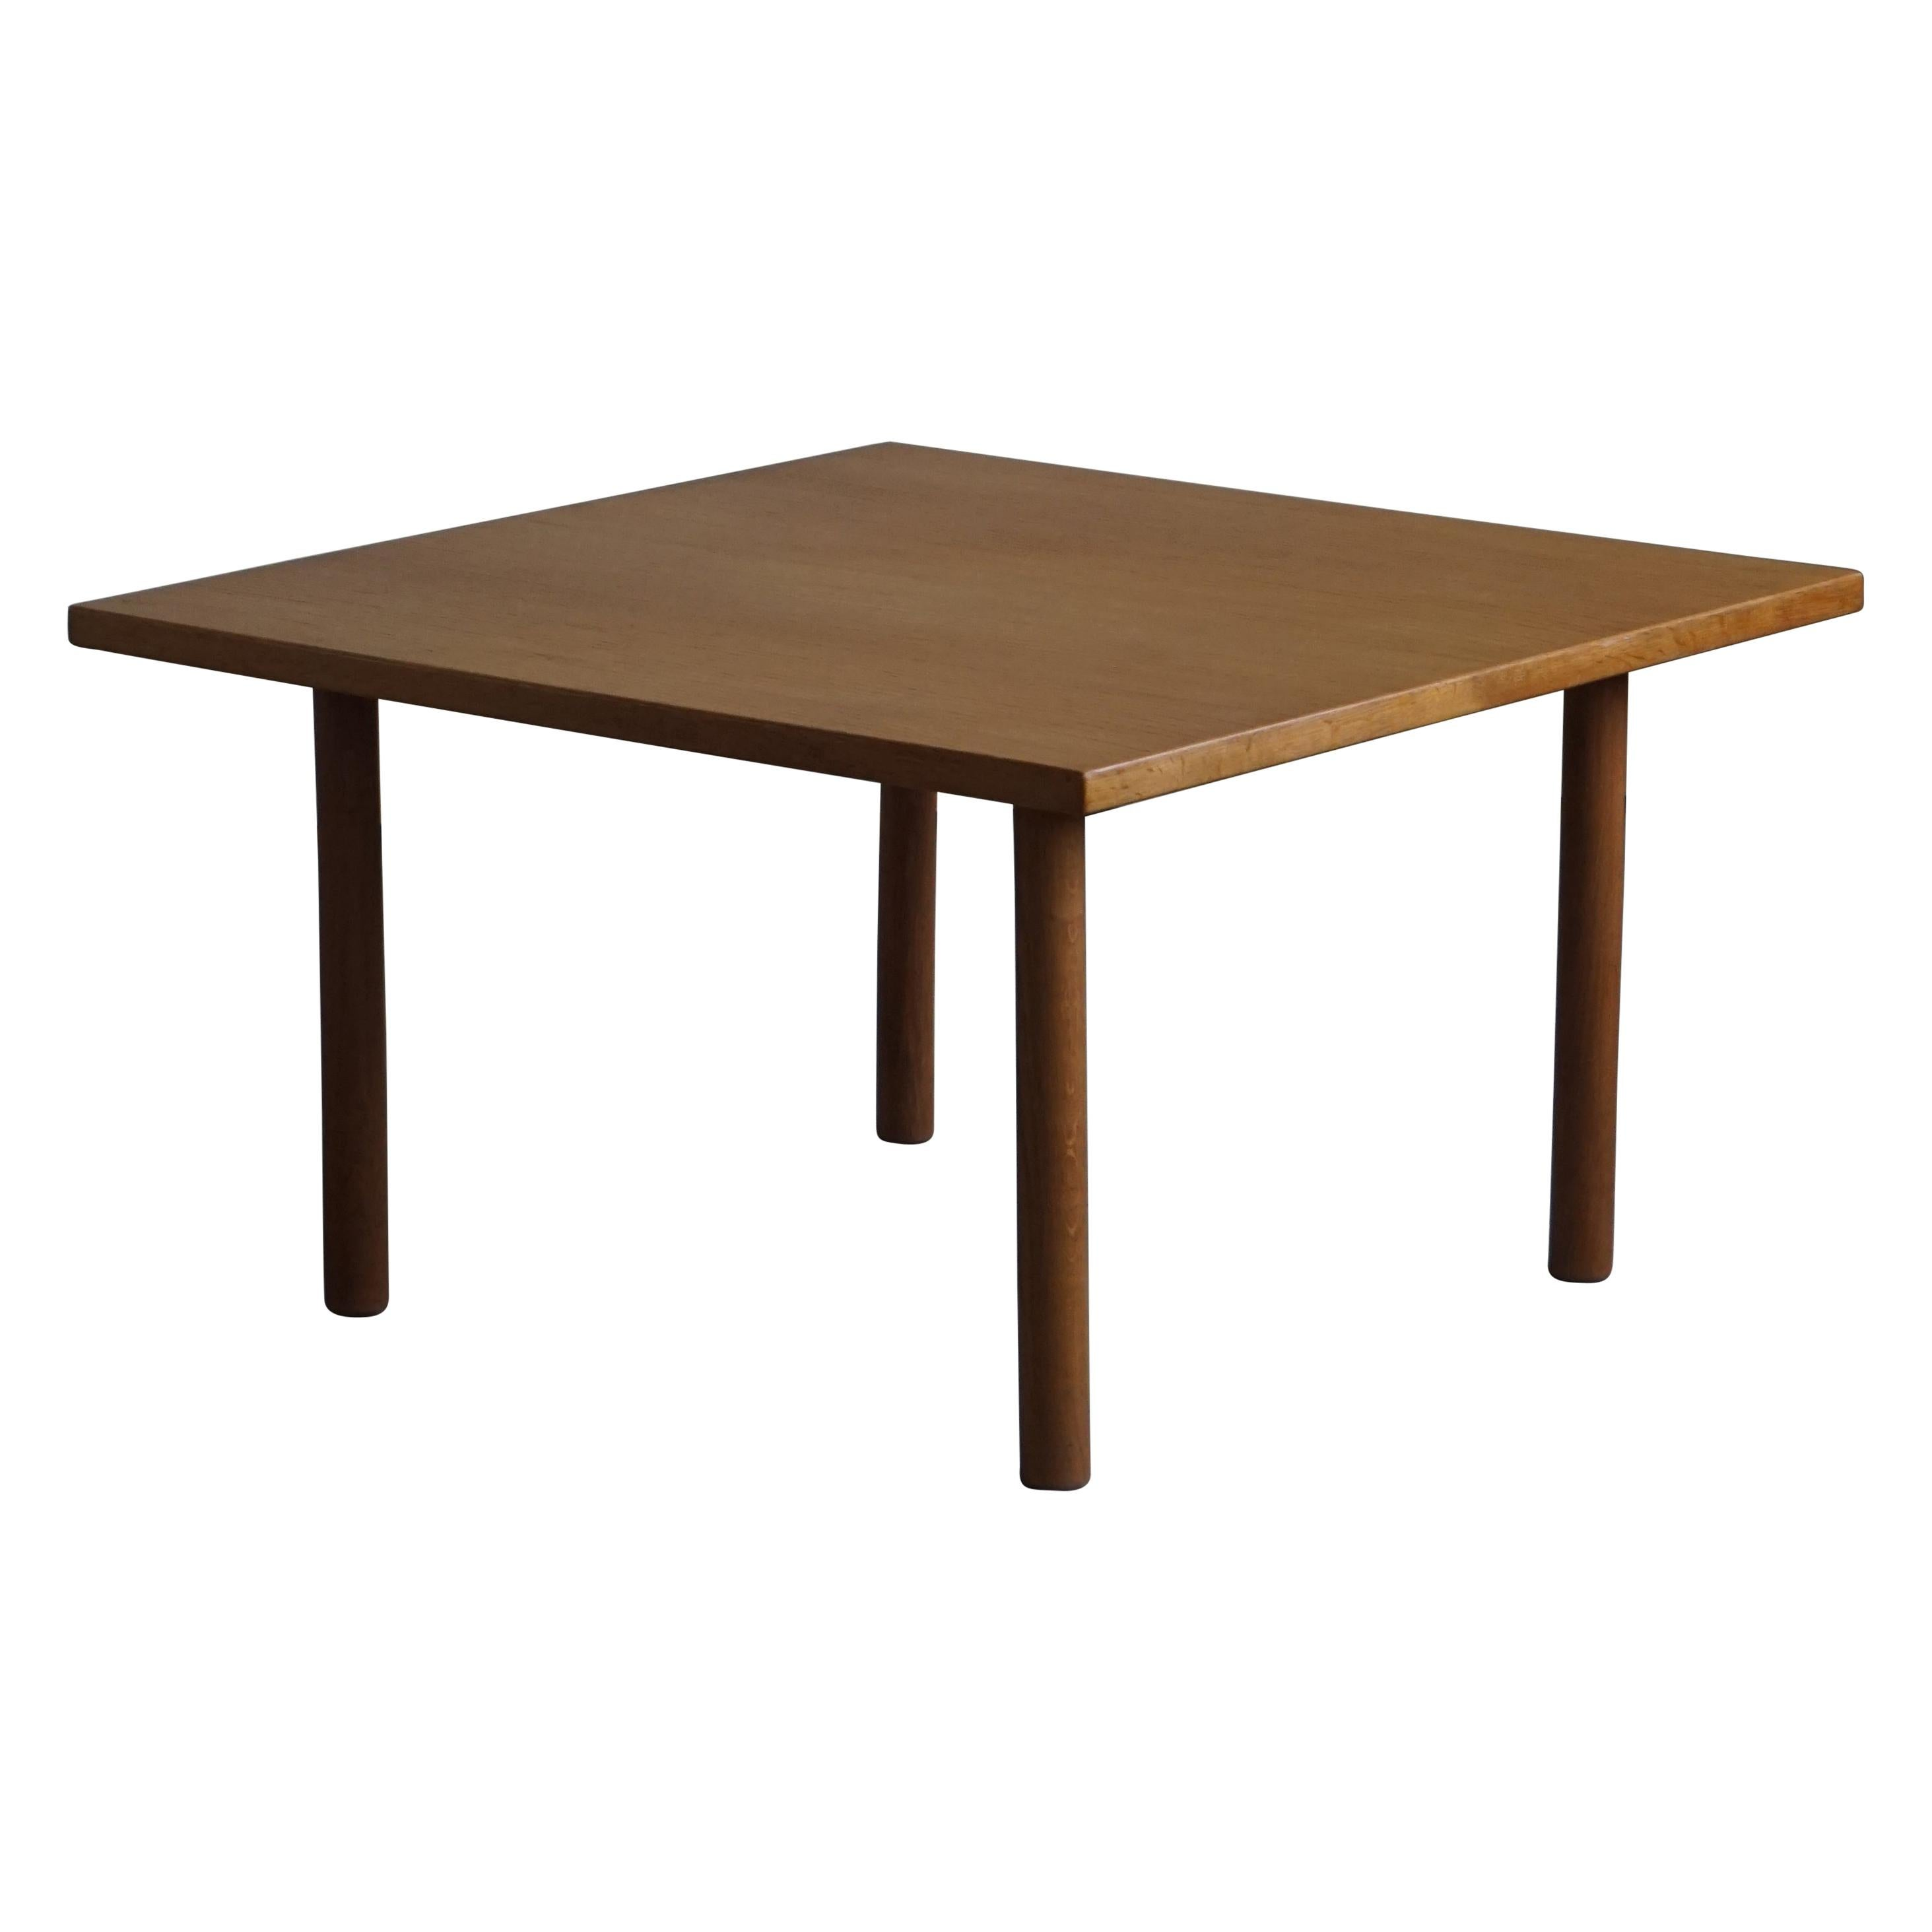 Danish Modern Oak Coffee Table by Hans J. Wegner for Andreas Tuck, 1960s